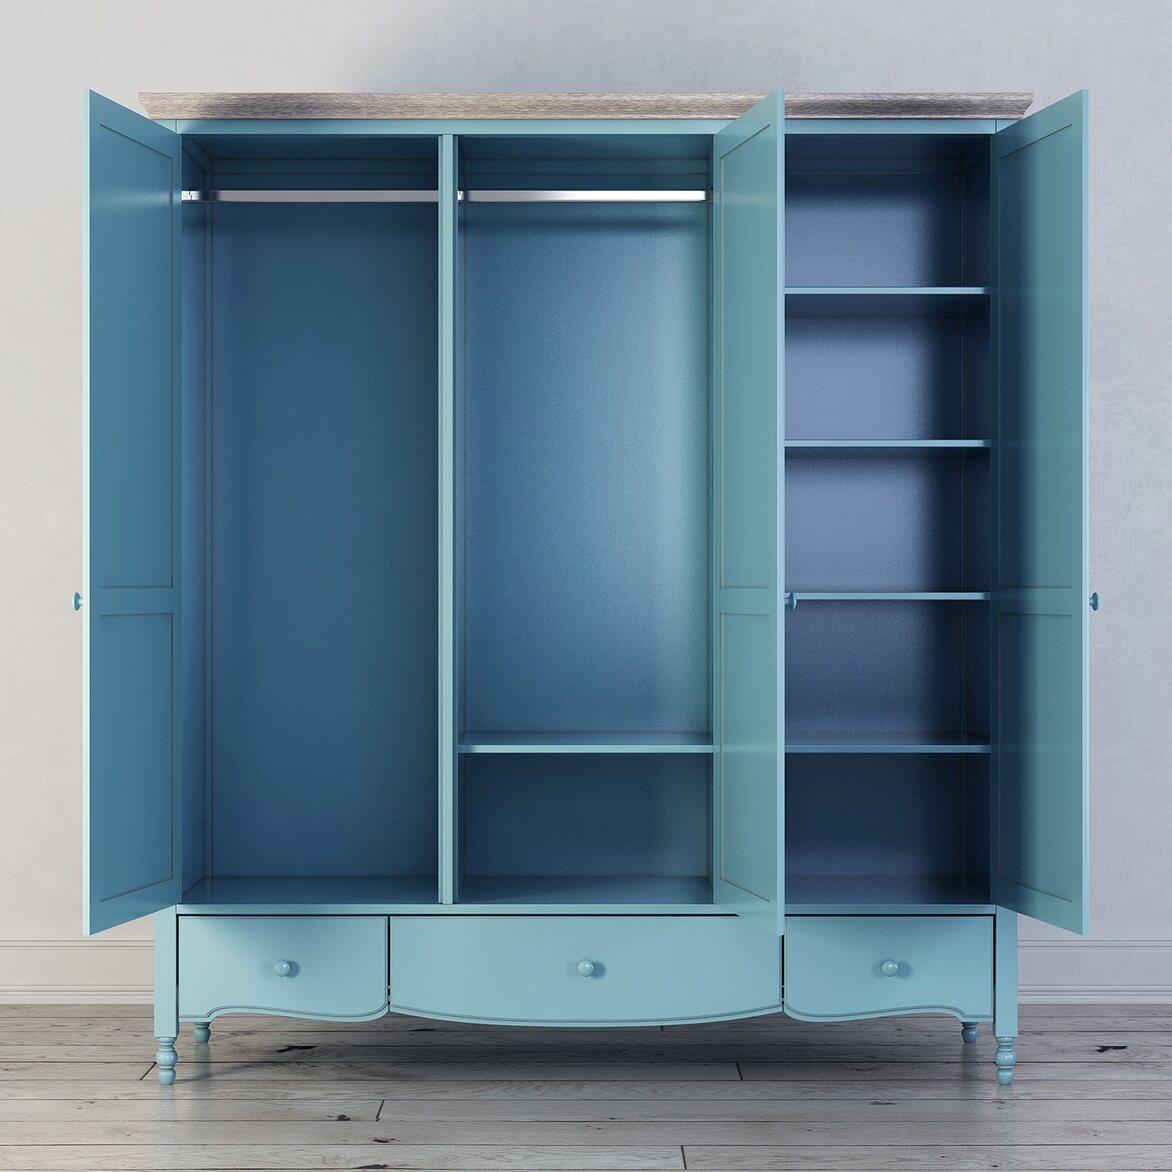 Шкаф трехстворчатый Leblanc, голубой 2   Платяные шкафы Kingsby